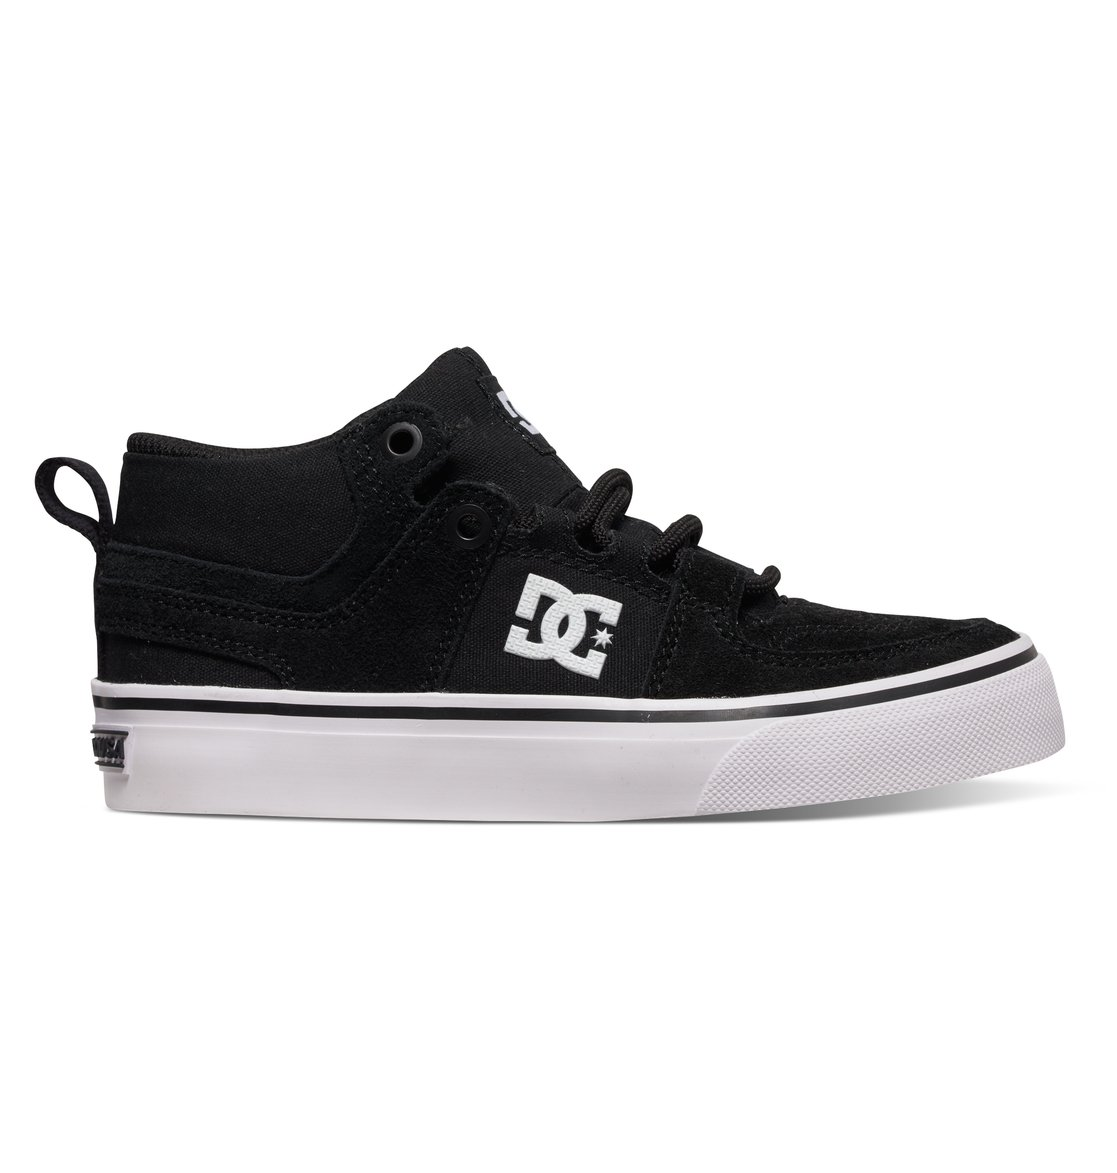 Chaussures de skate DC shoes LYNX VULC SE sBd1KEBe5L